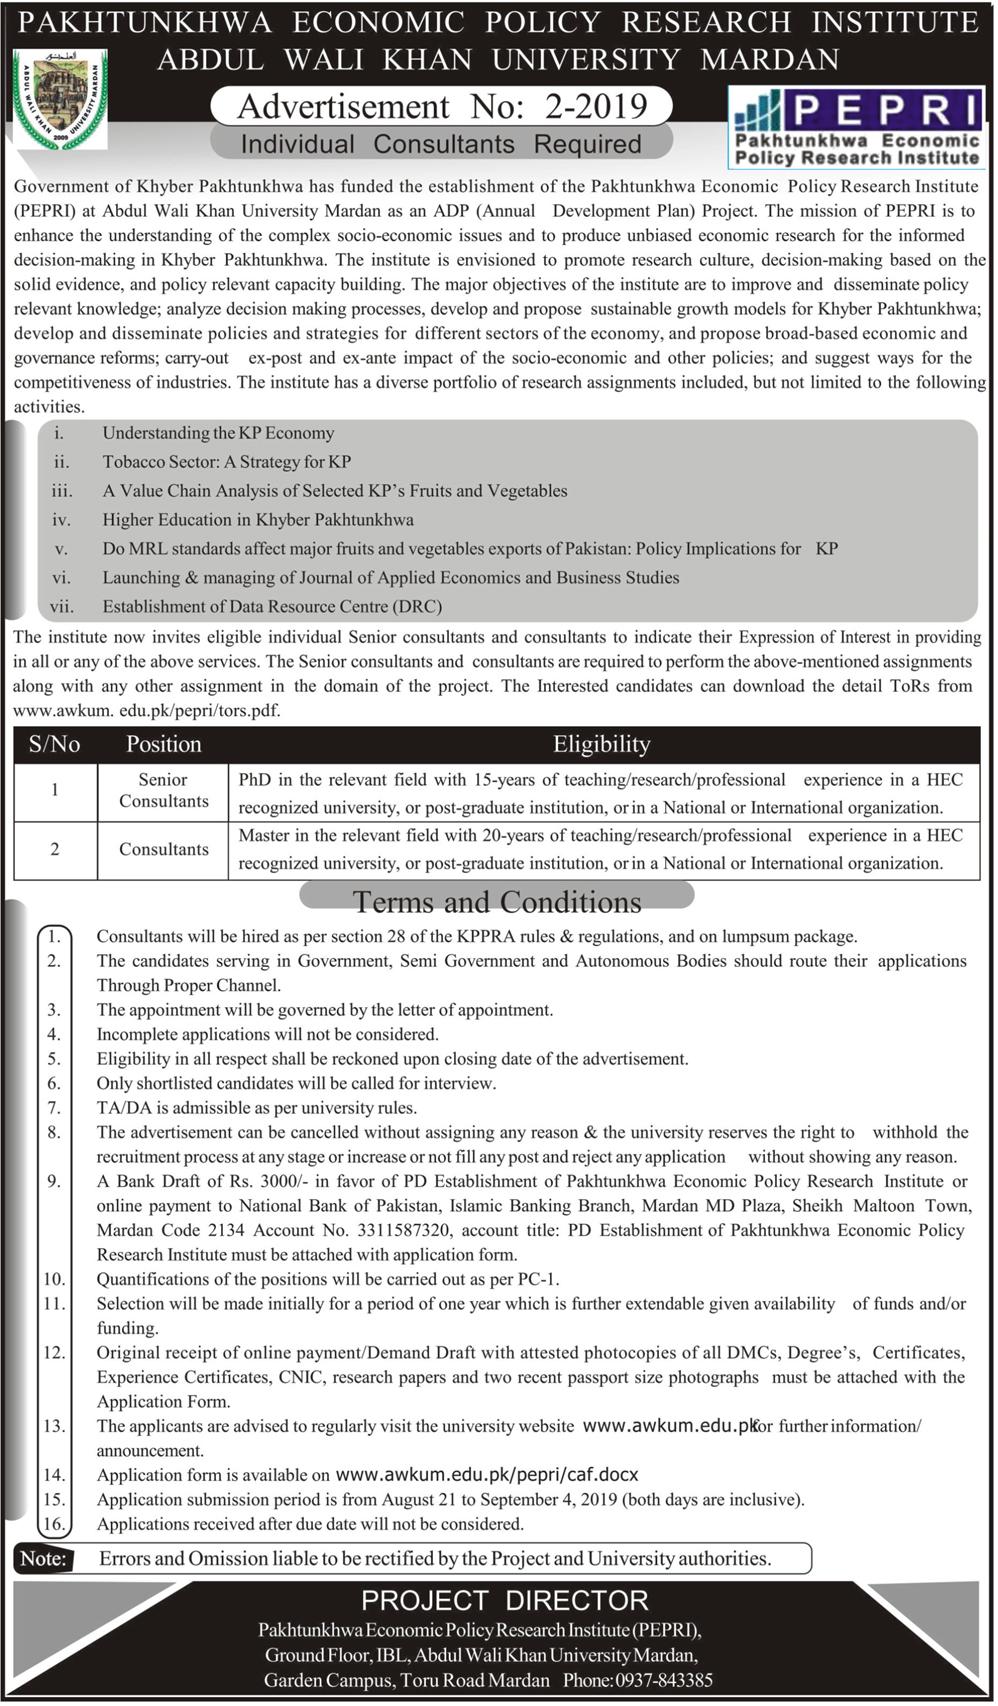 Abdul Wali Khan University Mardan jobs 2019